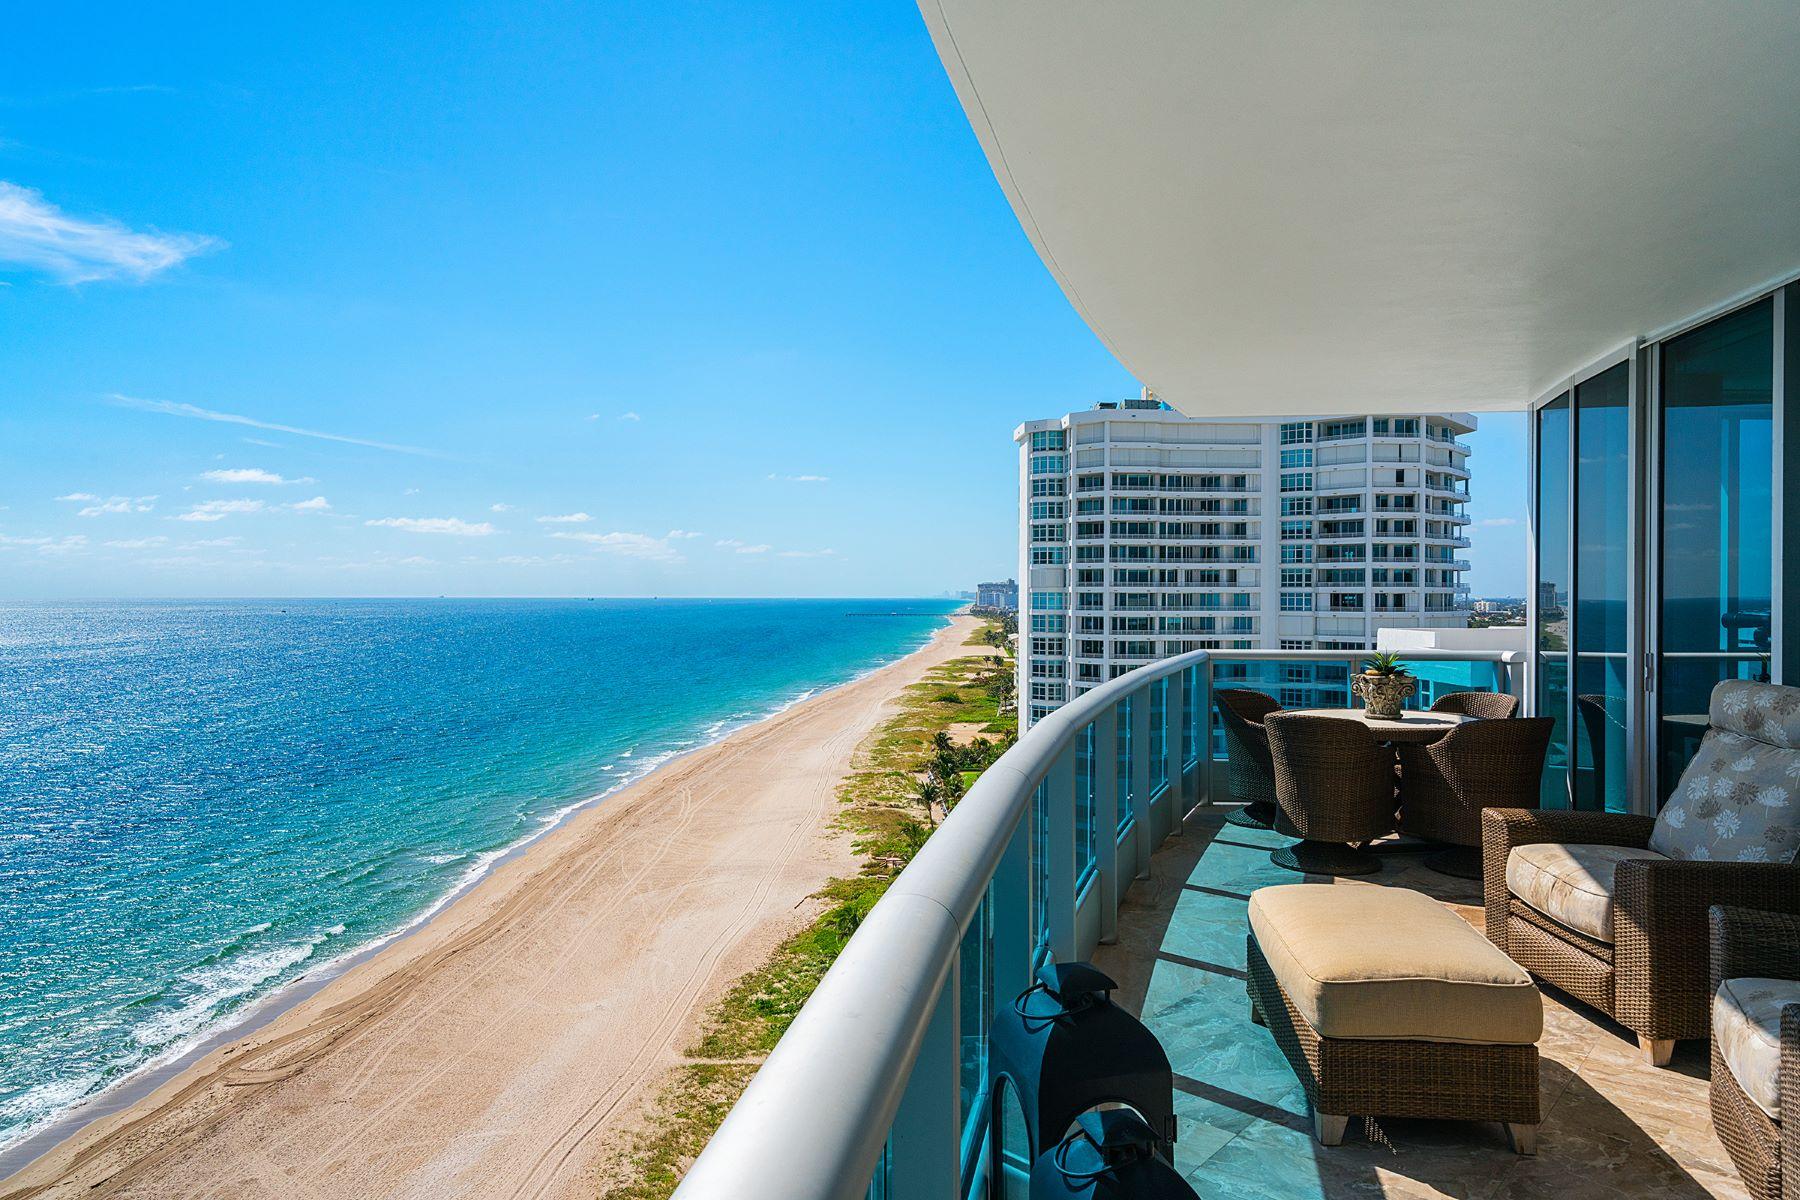 Condominium for Sale at 1600 S Ocean Blvd 1600 S Ocean Blvd 1501, Lauderdale By The Sea, Florida, 33062 United States